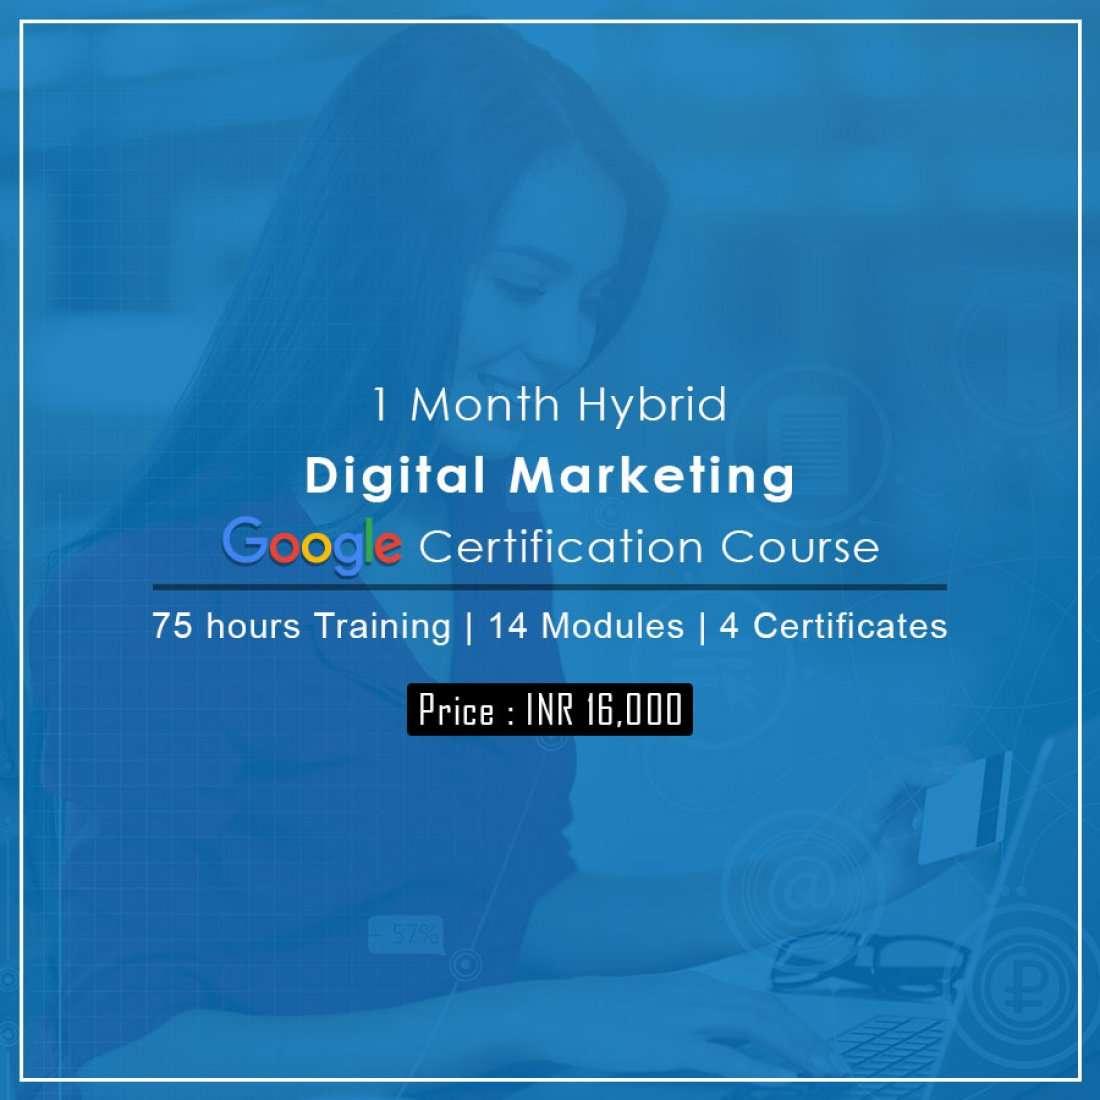 1 Month Digital Marketing Google Certification Program At Ies